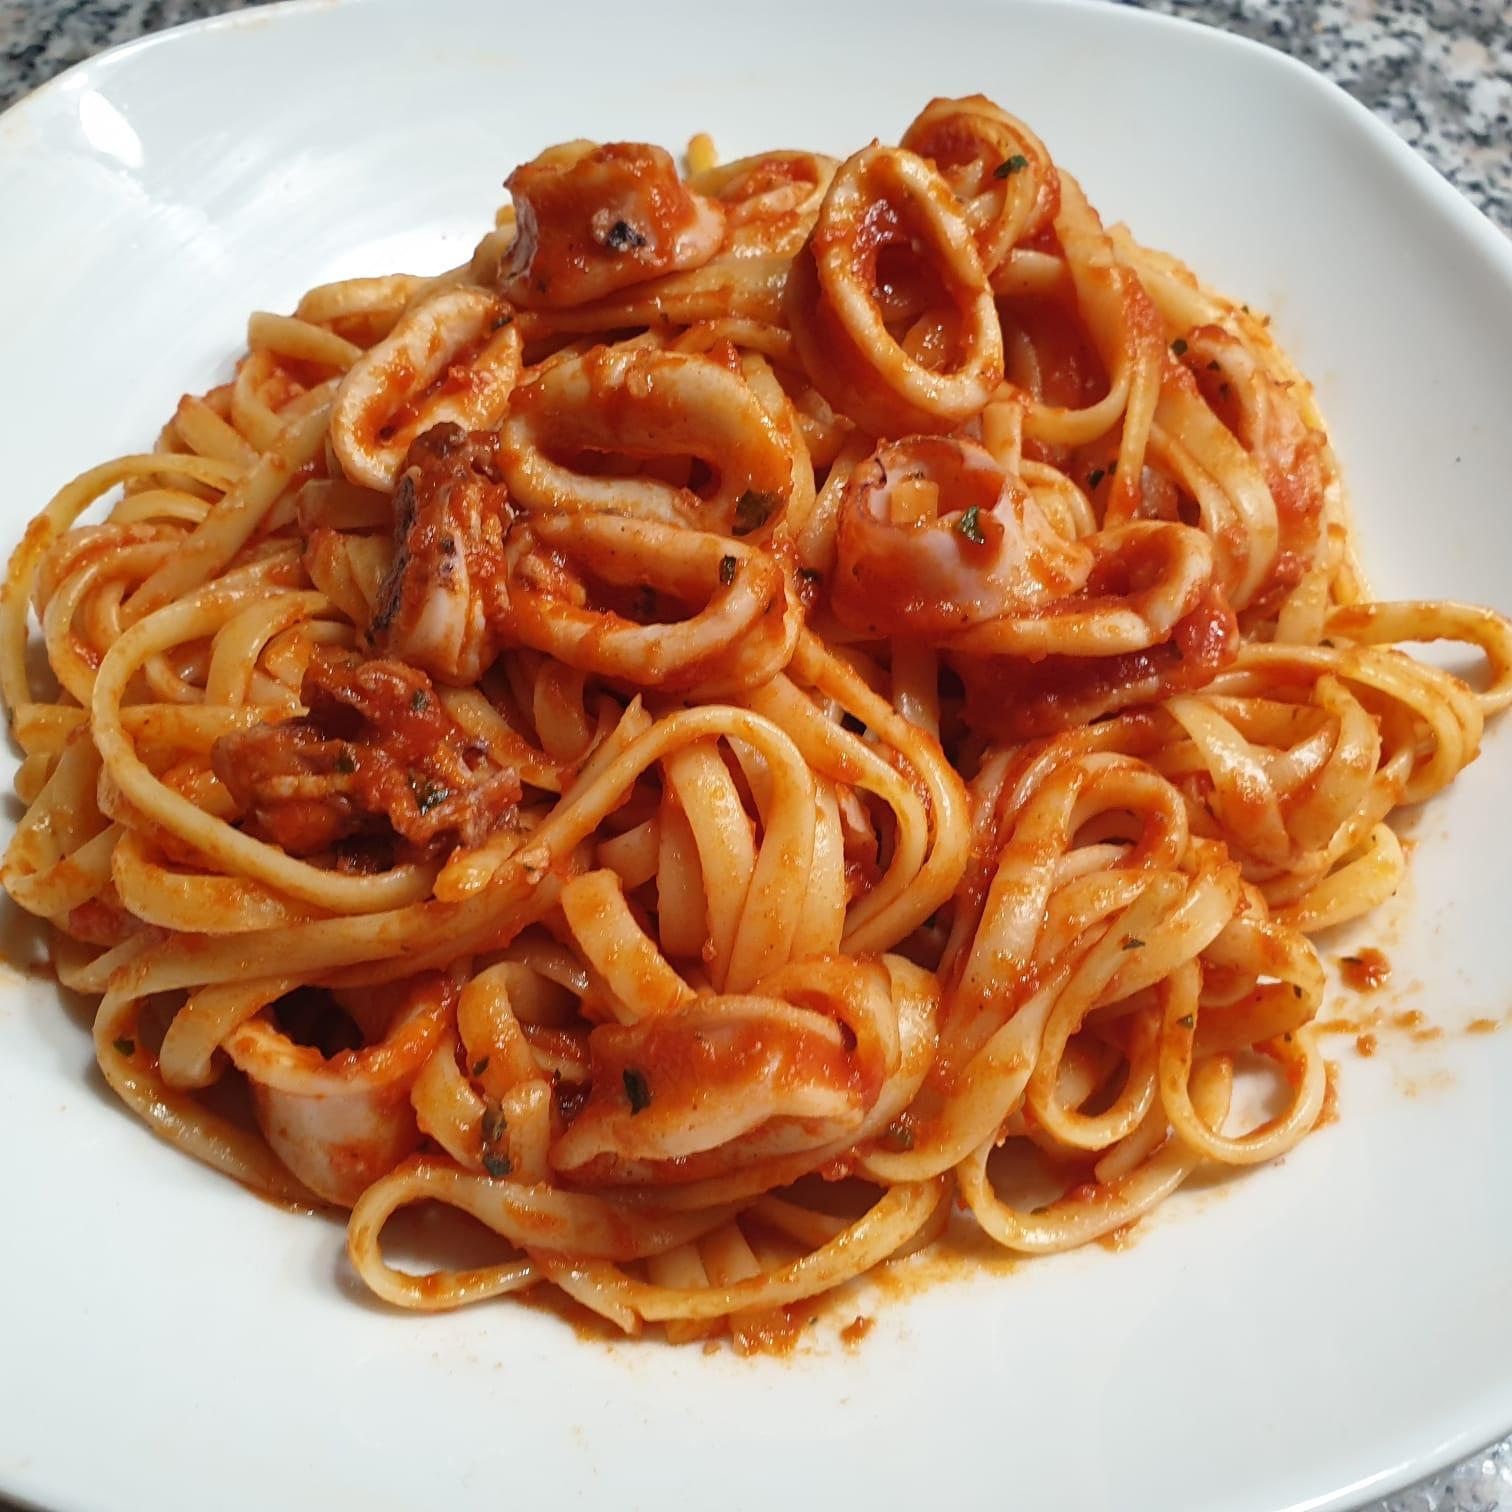 image from Bavette mit Calamari-Sughetto | Spaghetti (n13) mit Kalmar Soße (leicht pikant)